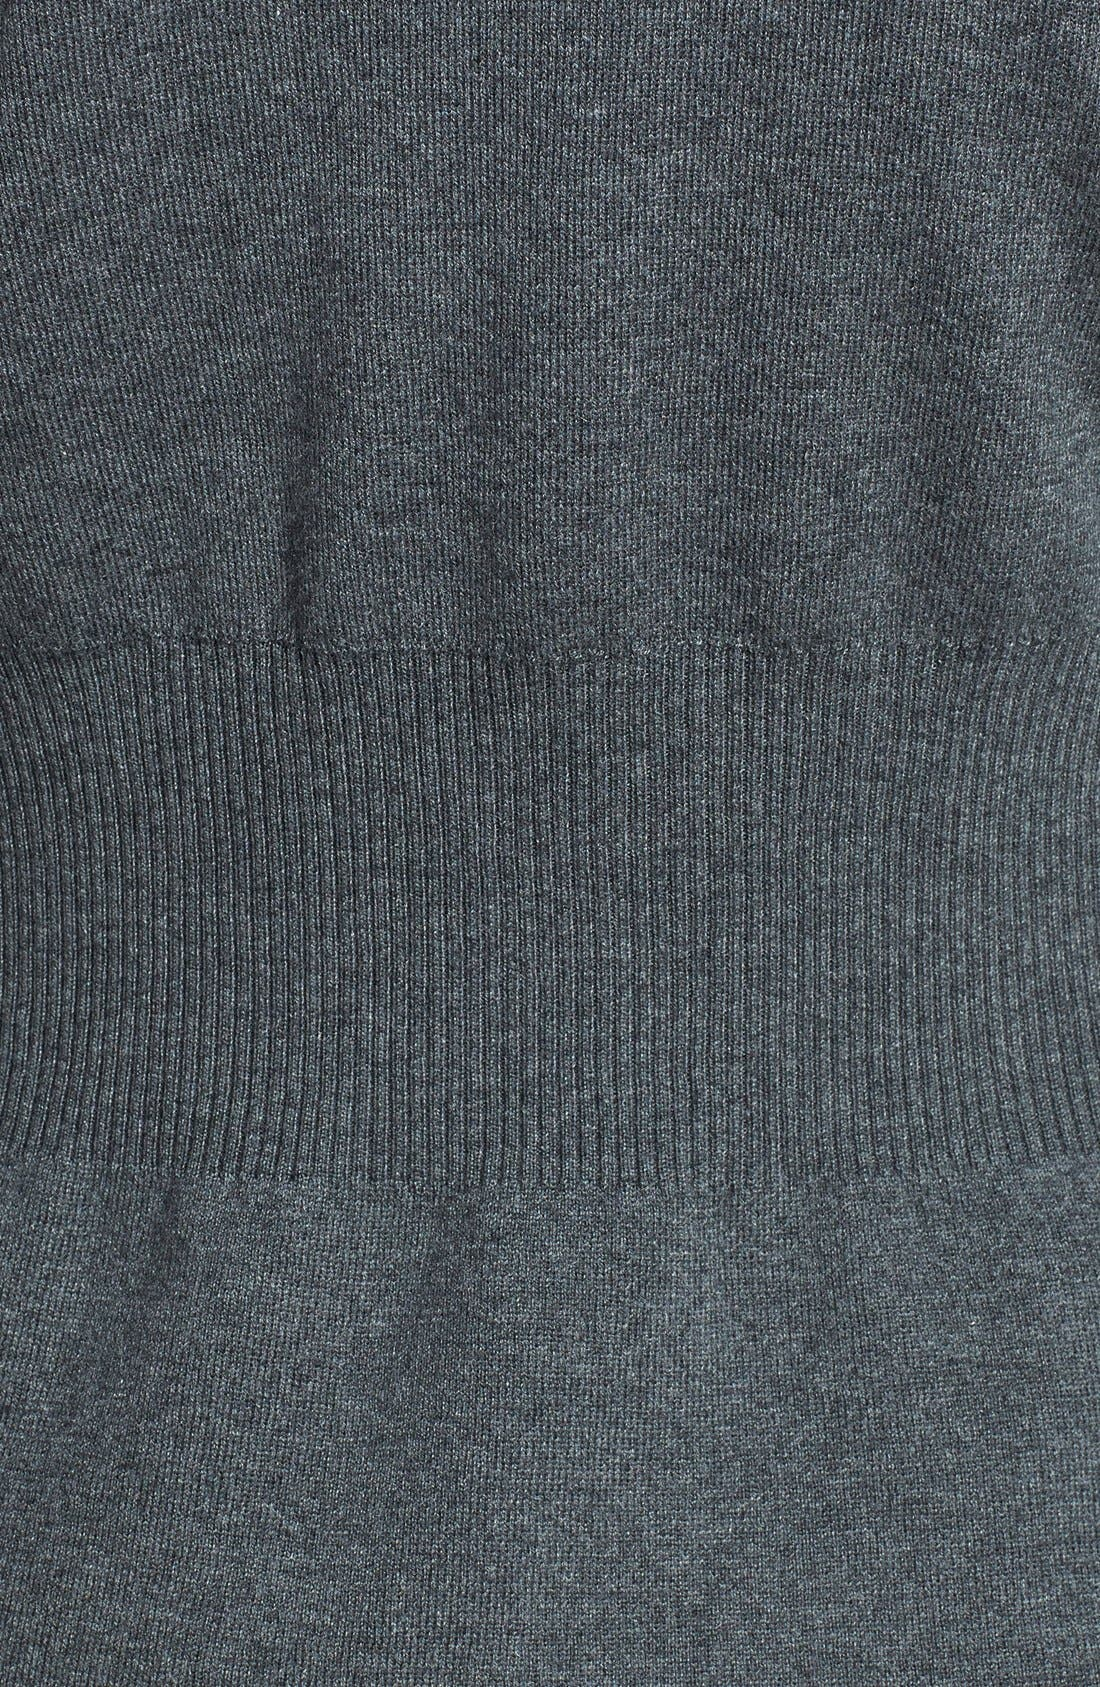 Alternate Image 3  - NIC+ZOE 'Back of the Chair' V-Neck Cardigan (Petite)